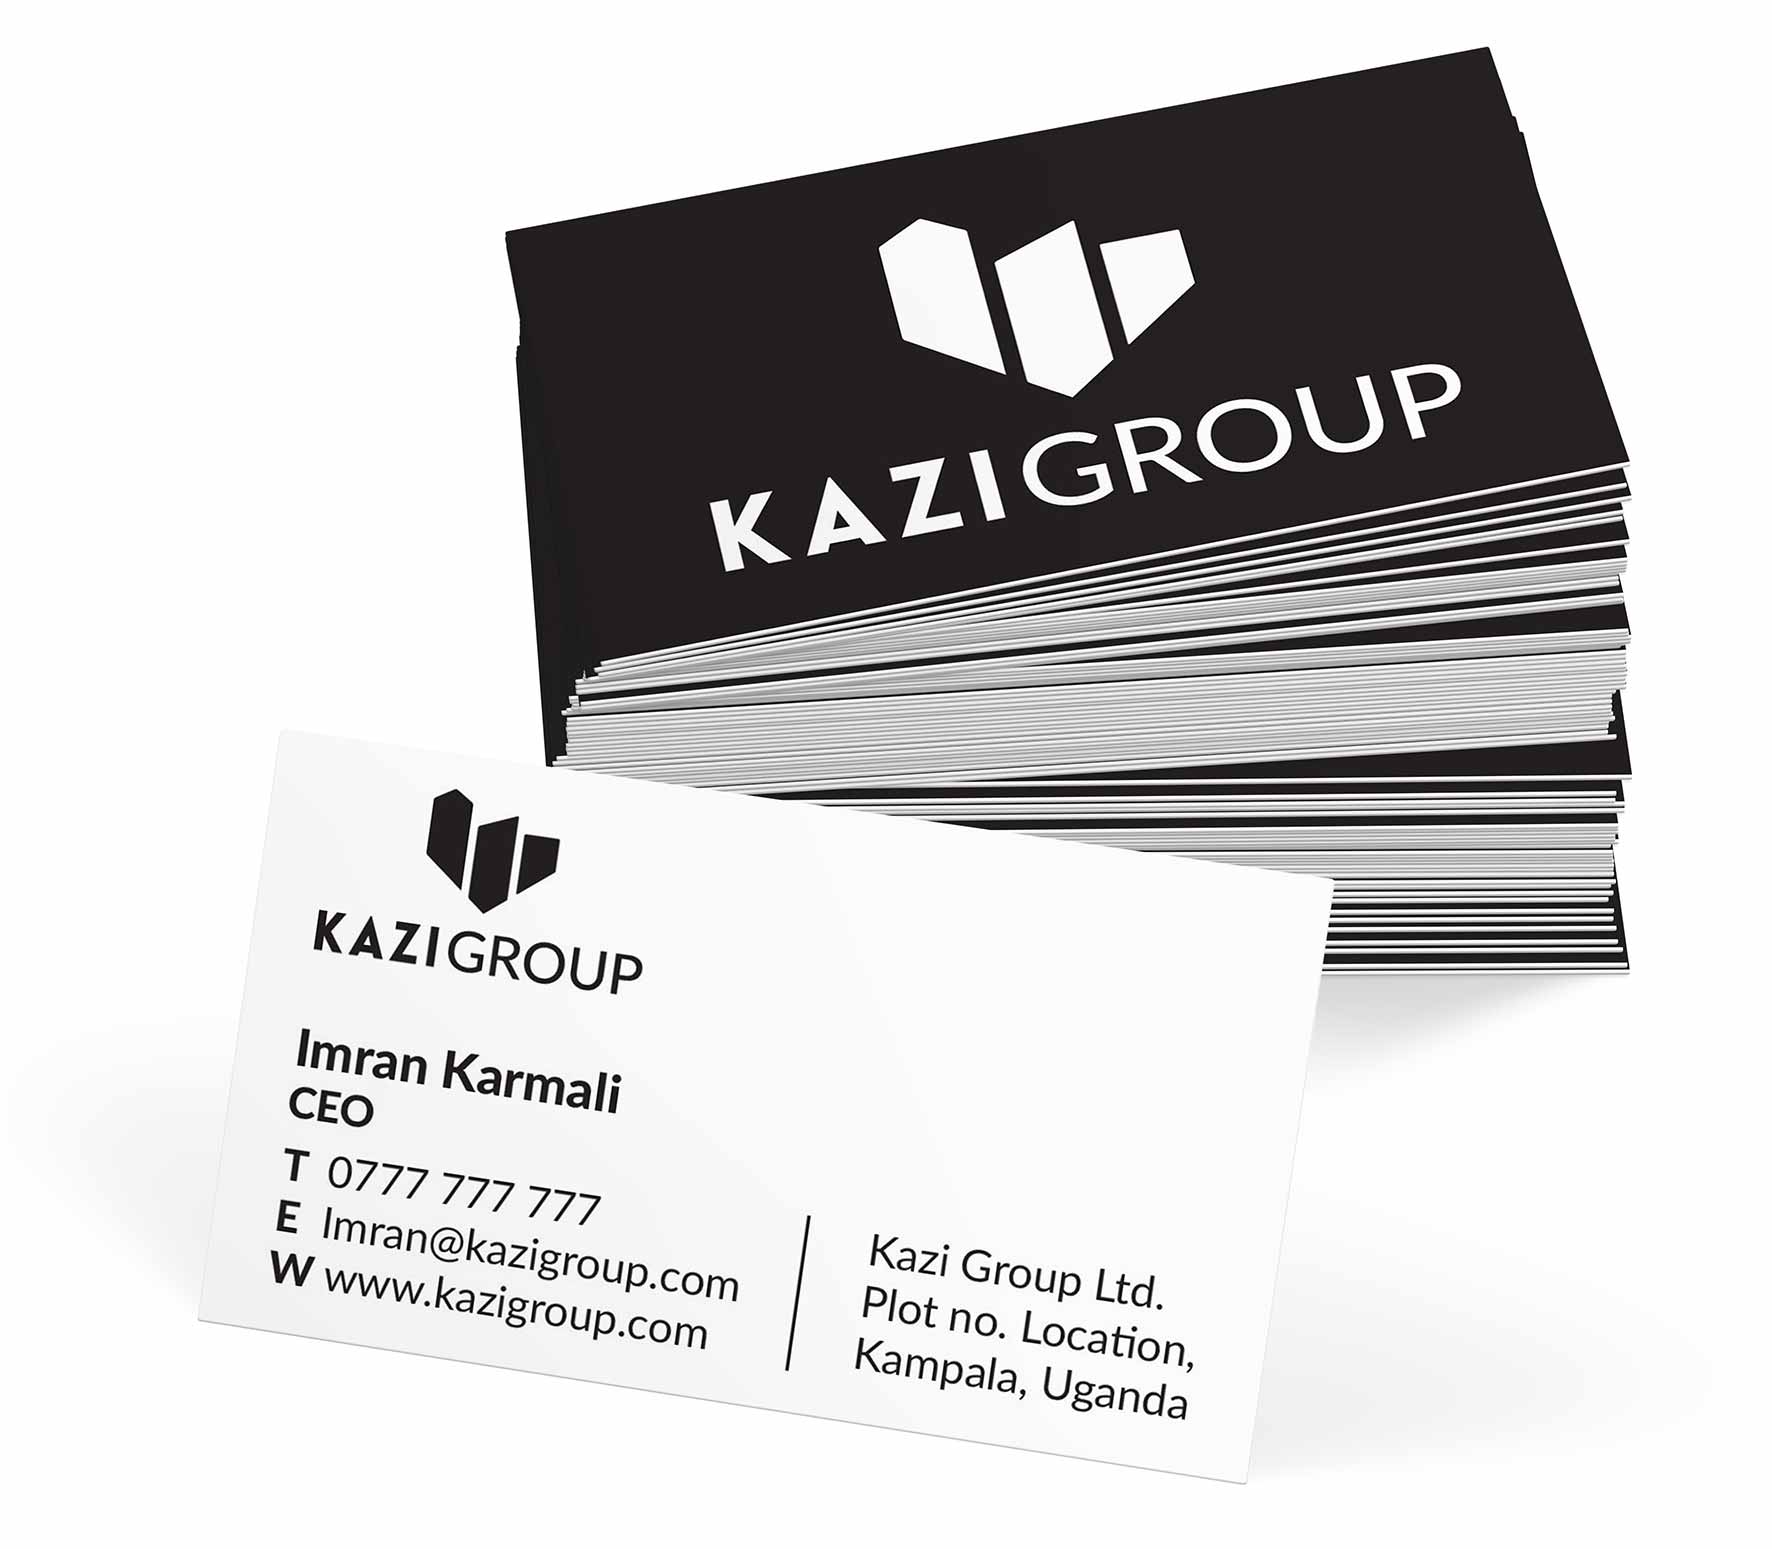 Kazi Group business cards